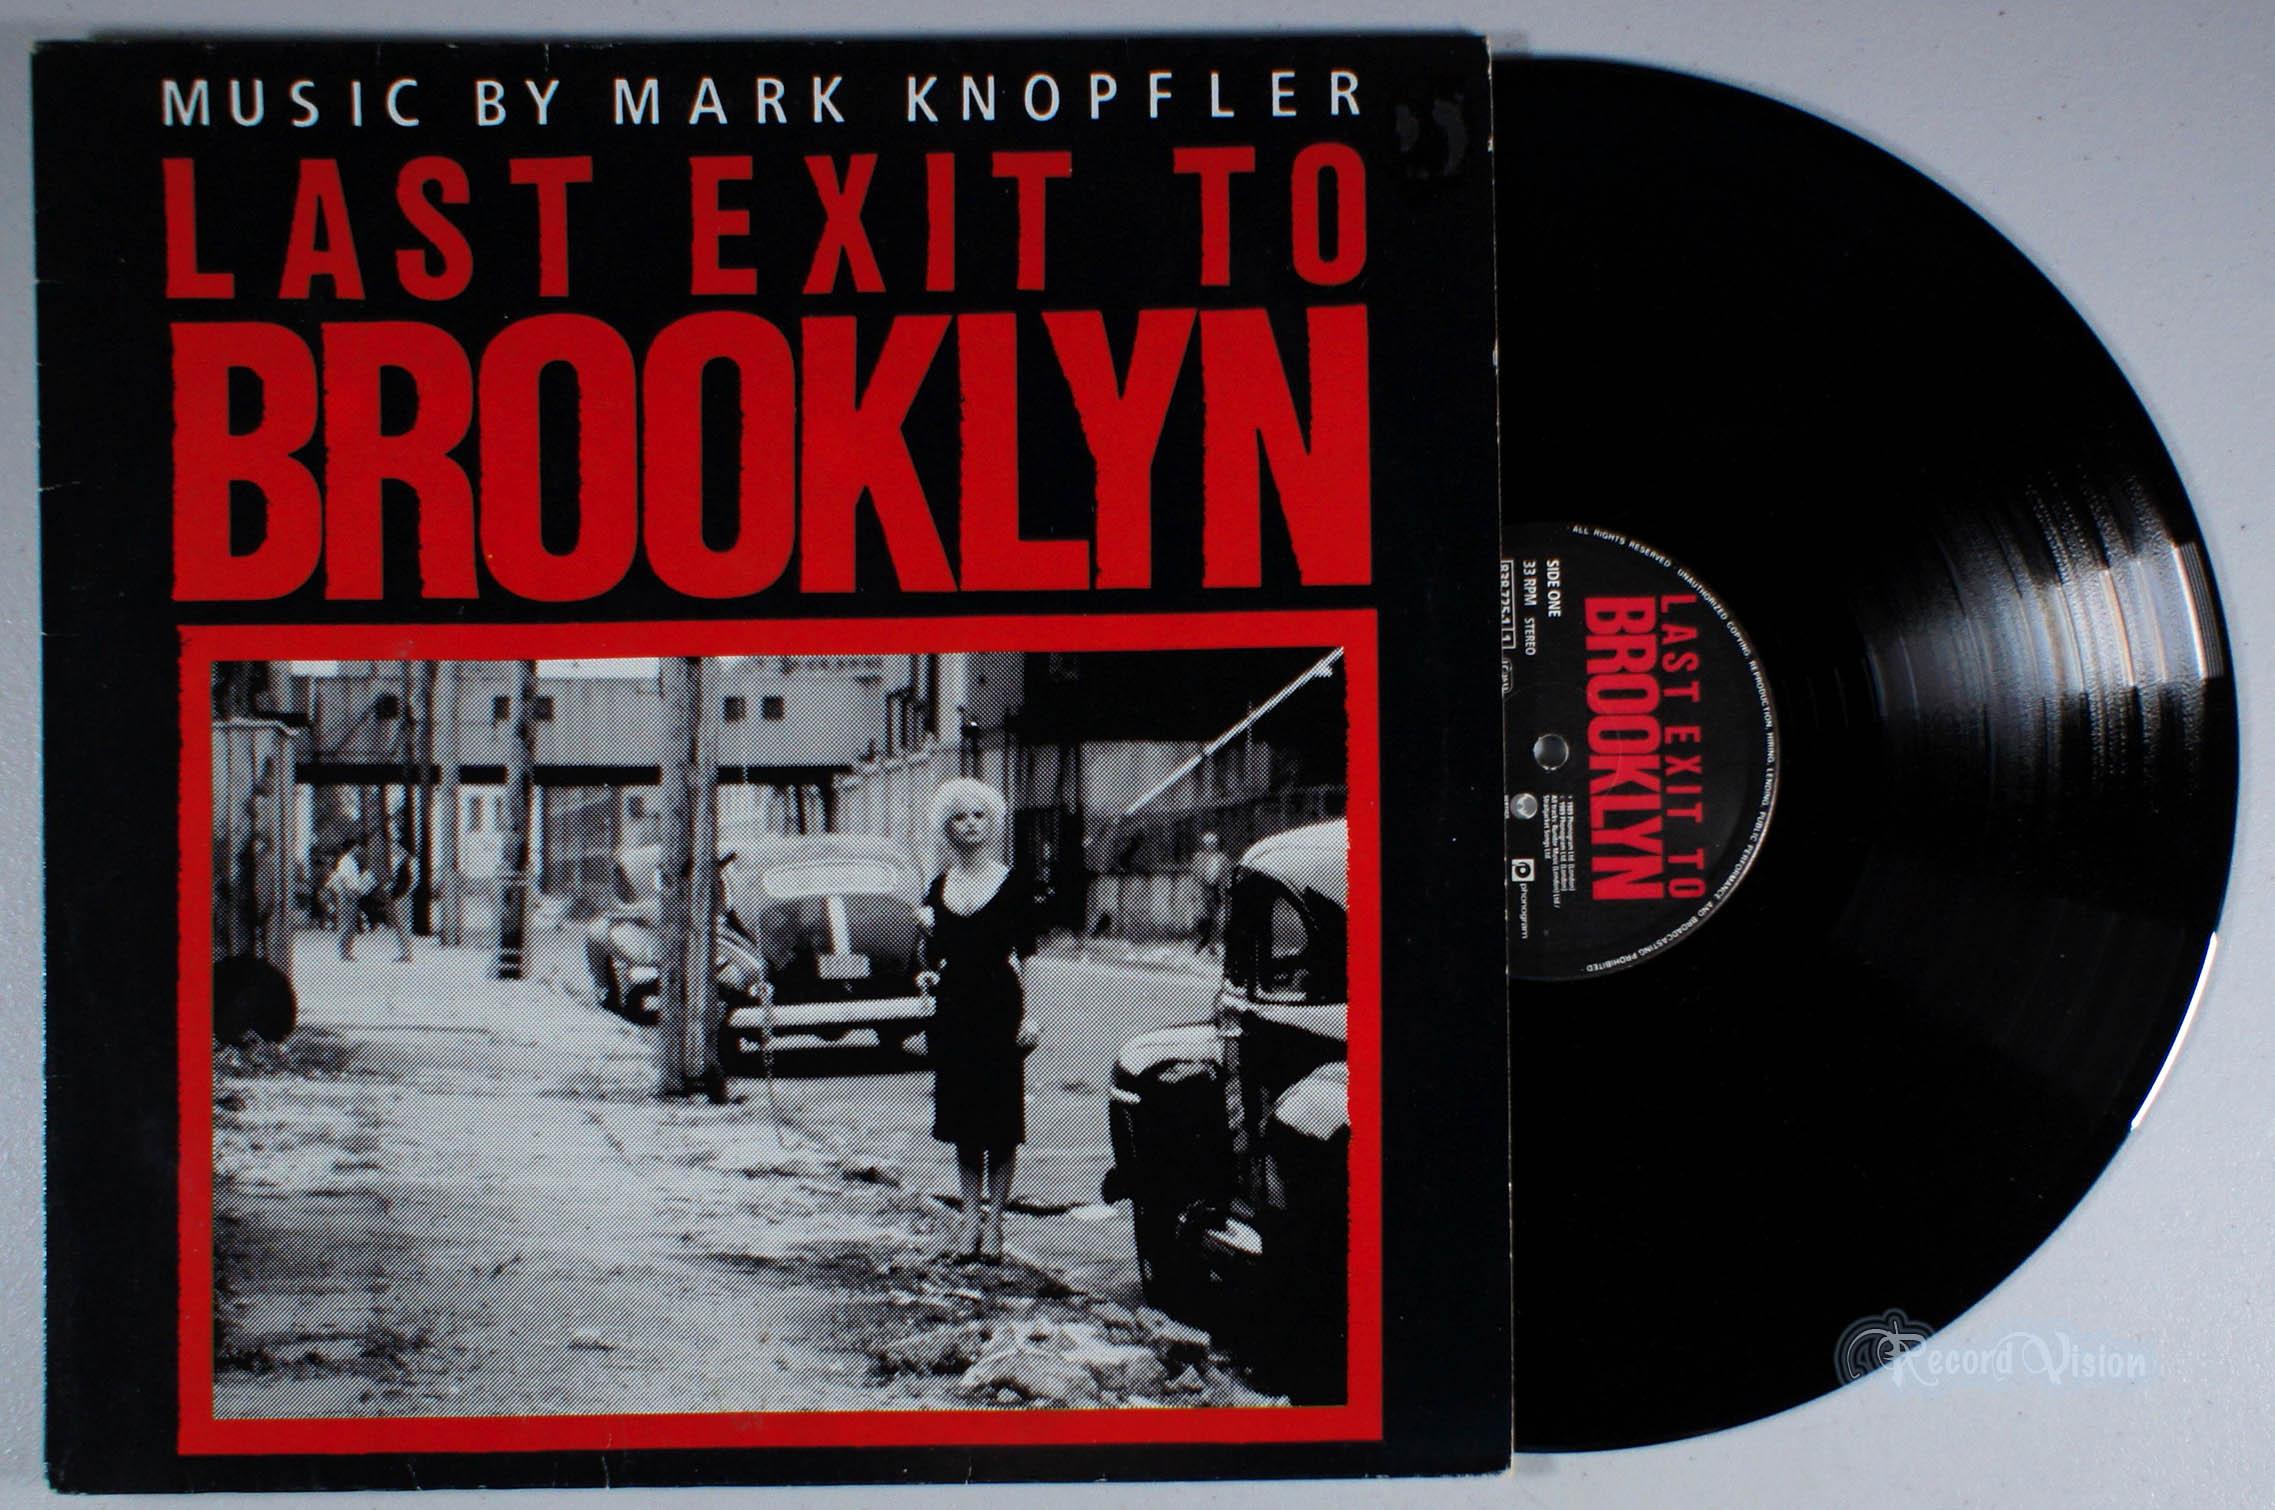 MARK KNOPFLER - Last Exit to Brooklyn - 33T